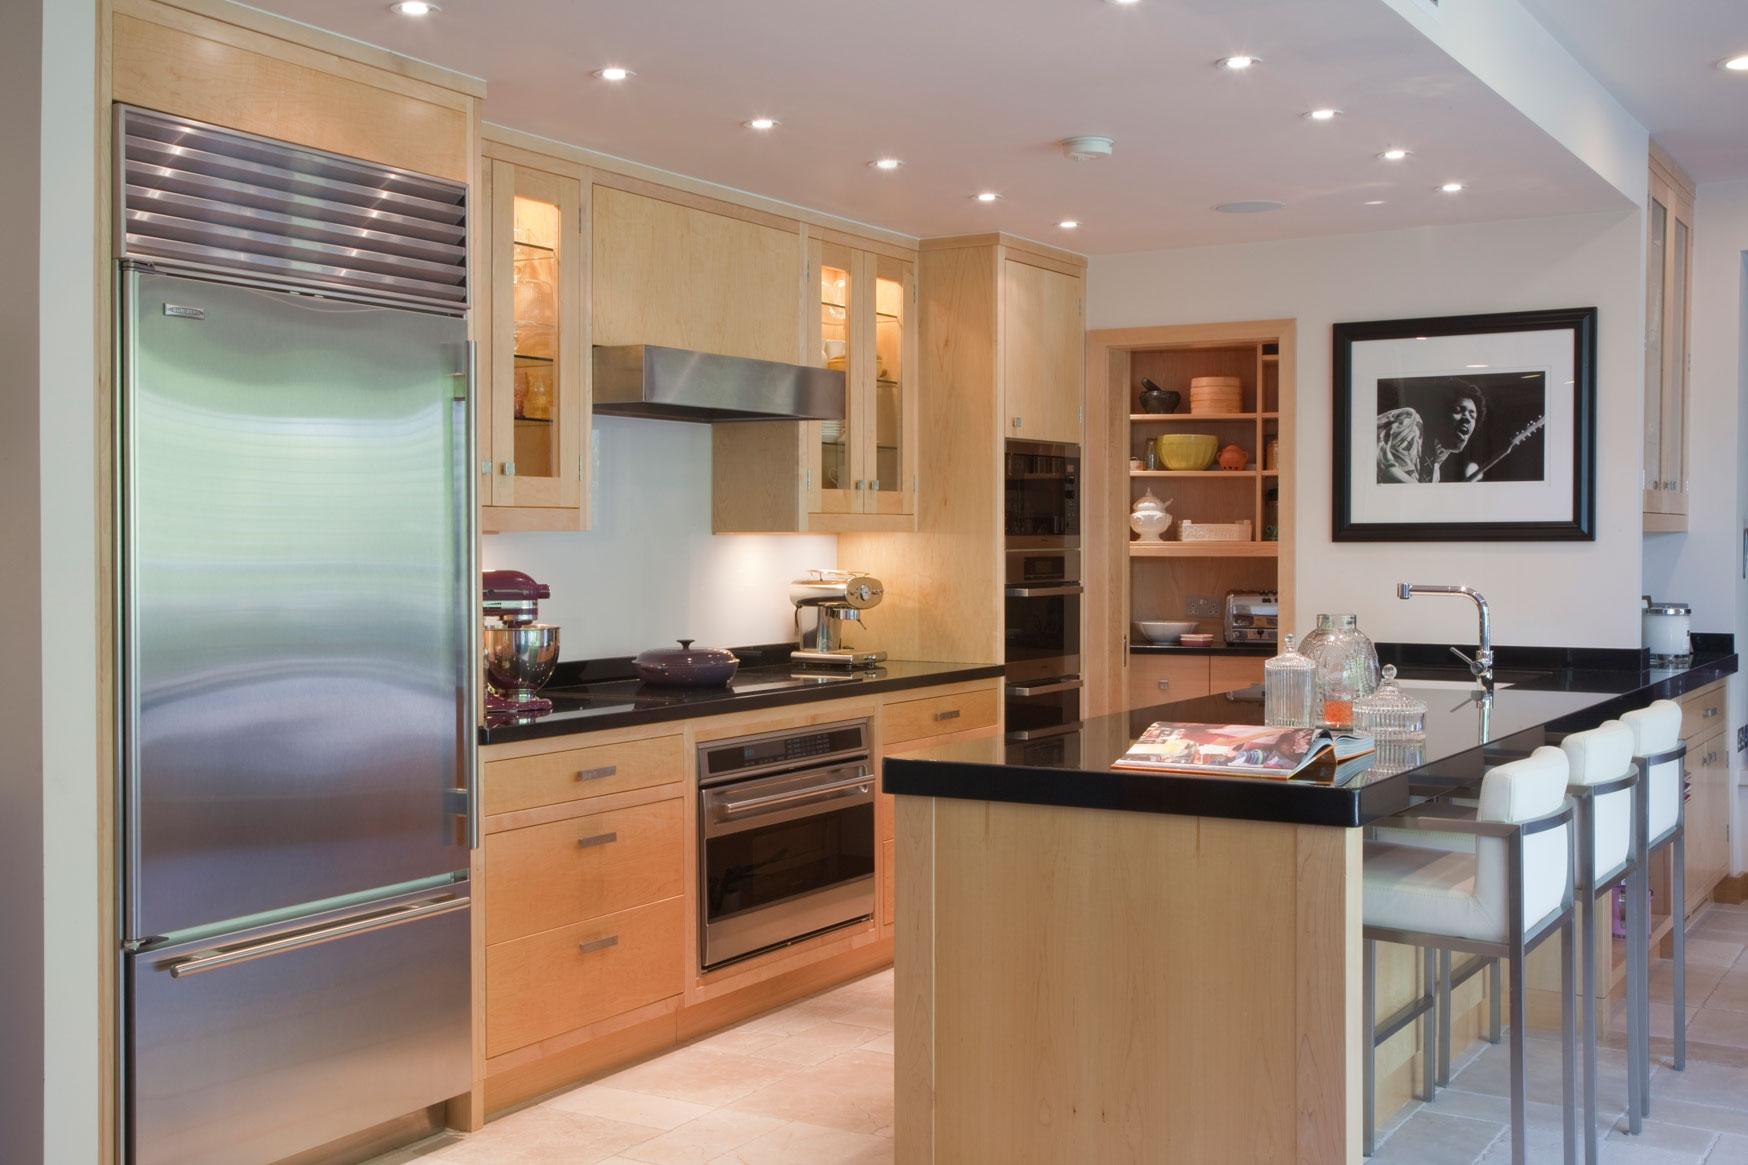 Maple kitchen by Woodstock Furniture. Kitchens start at around £30,000 inc VAT. www.woodstockfurnitu